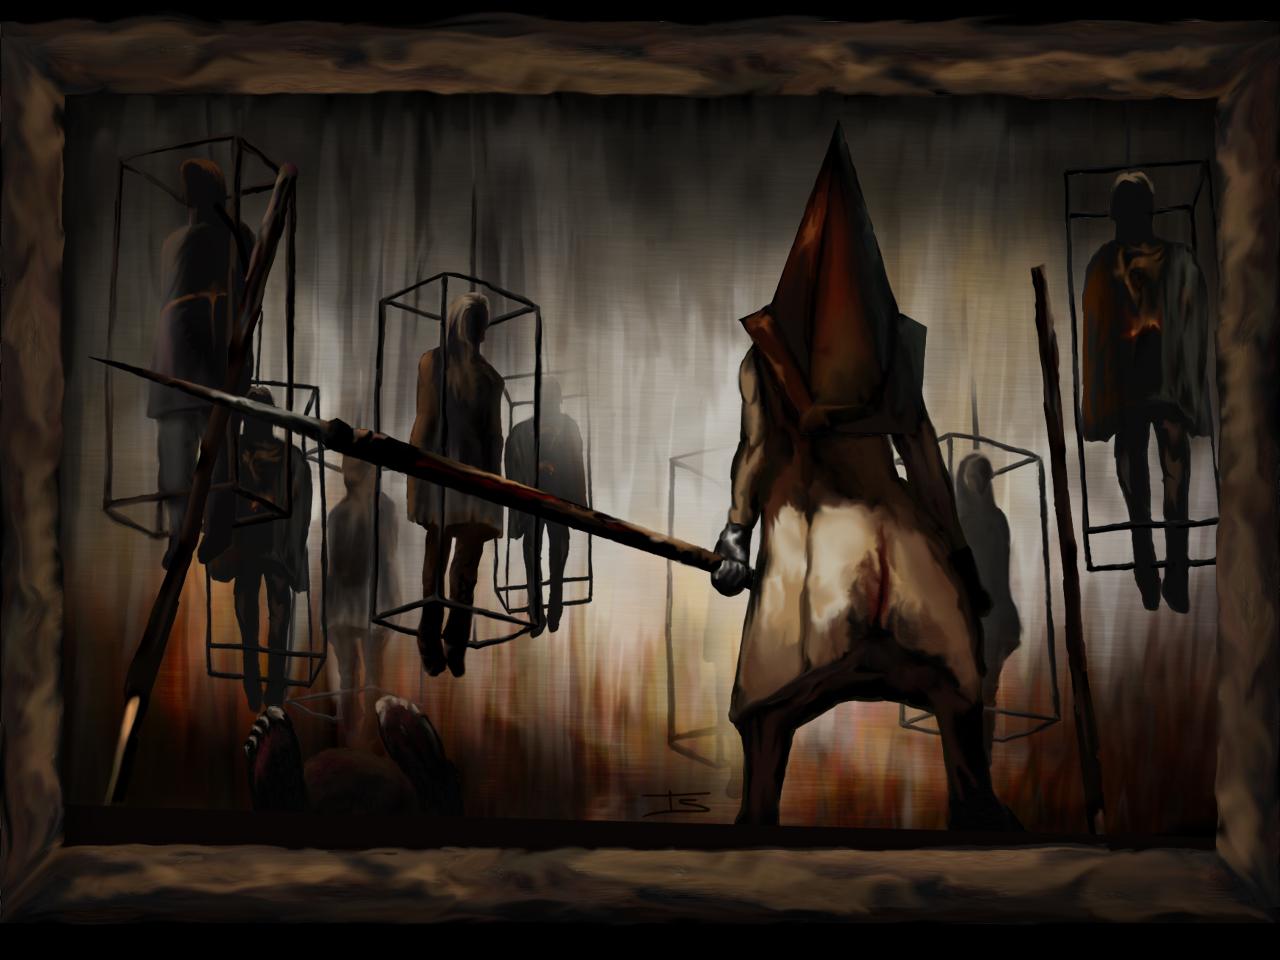 Images du jeu Silent Hill HD Collection (PS3/XBox 360) :